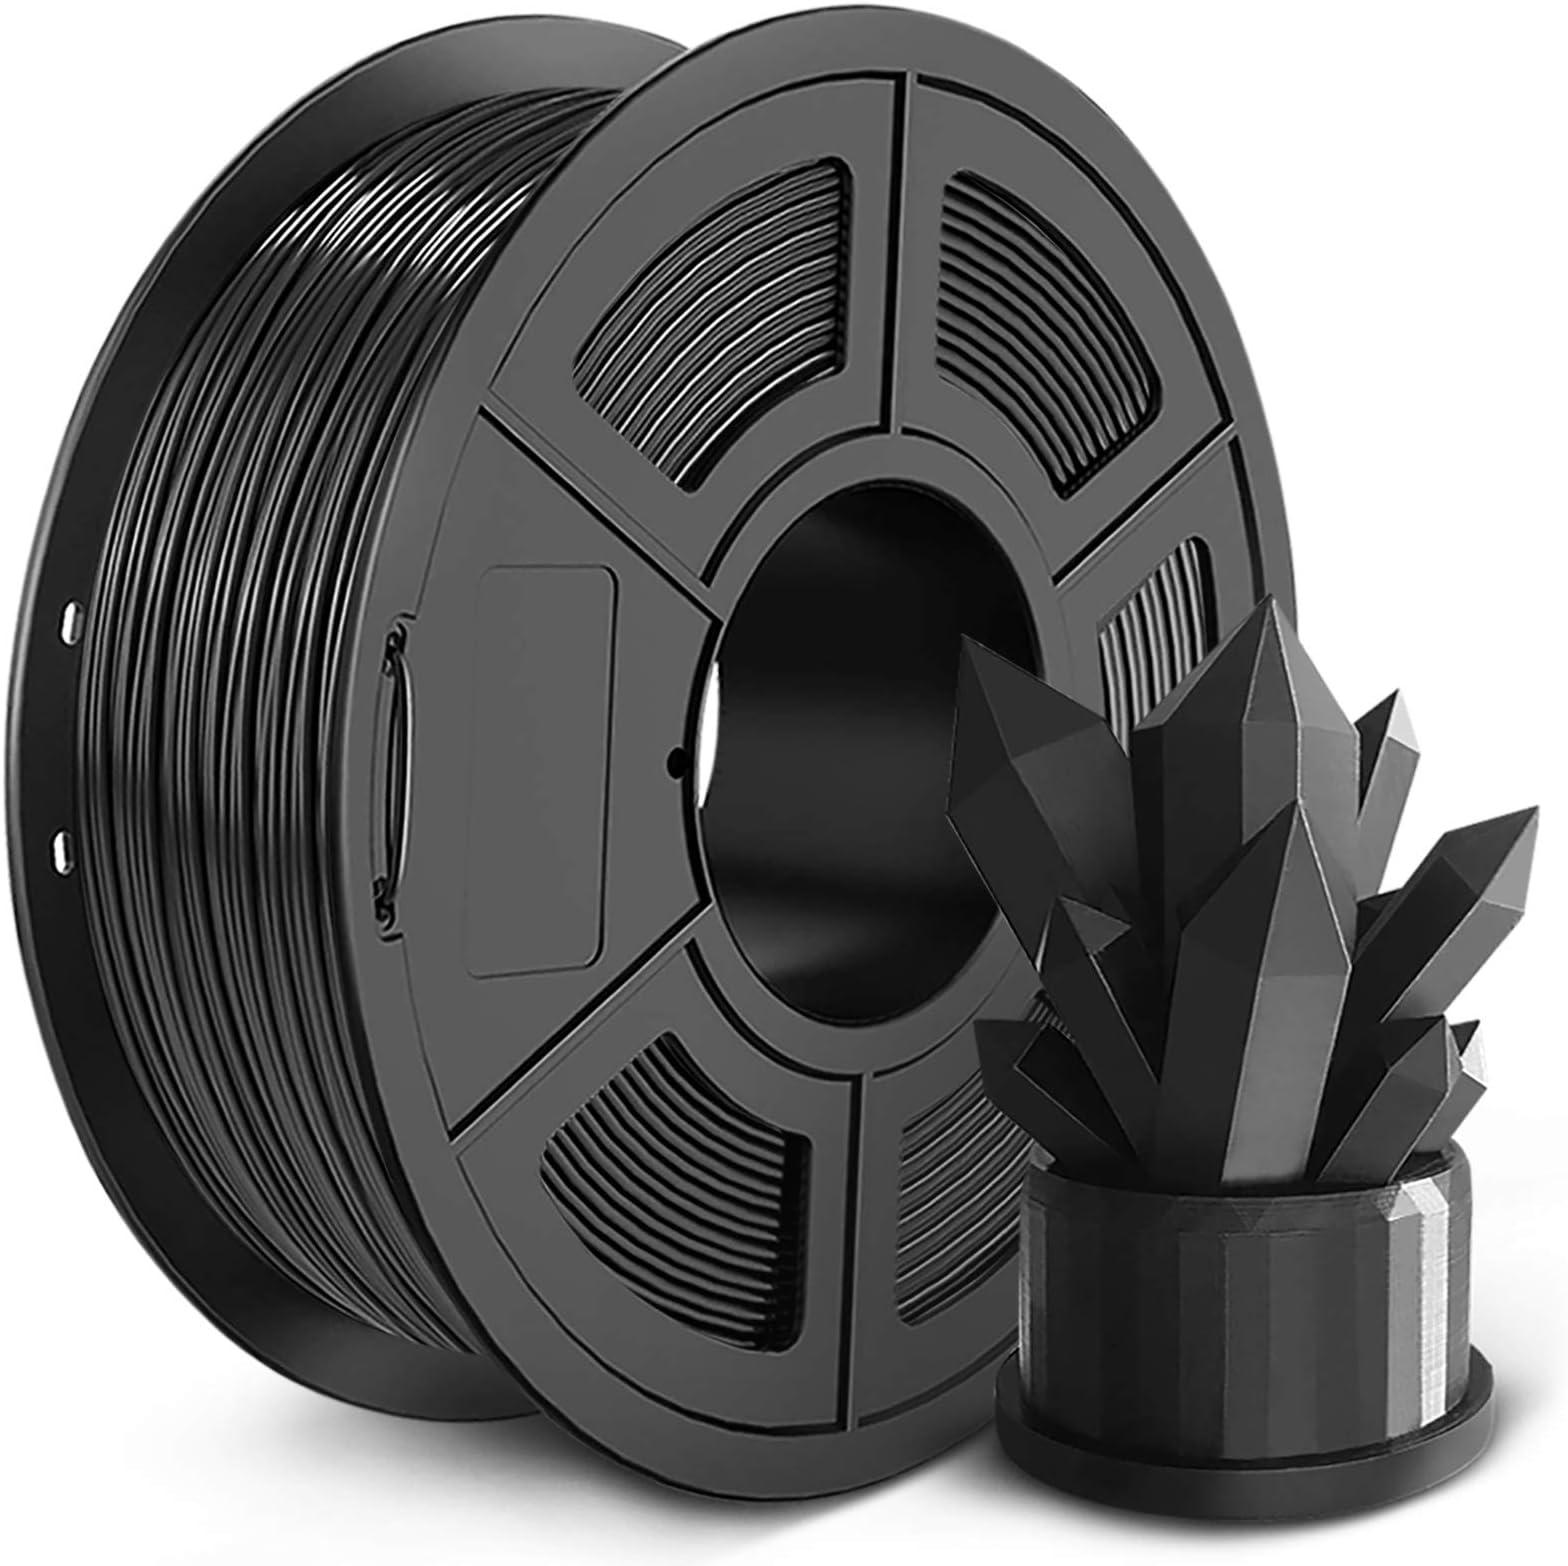 PLA 3D Printer Filament 1.75mm, SUNLU PLA Filament, Dimensional Accuracy +/- 0.02 mm, 1 kg Spool, PLA 1.75 Black